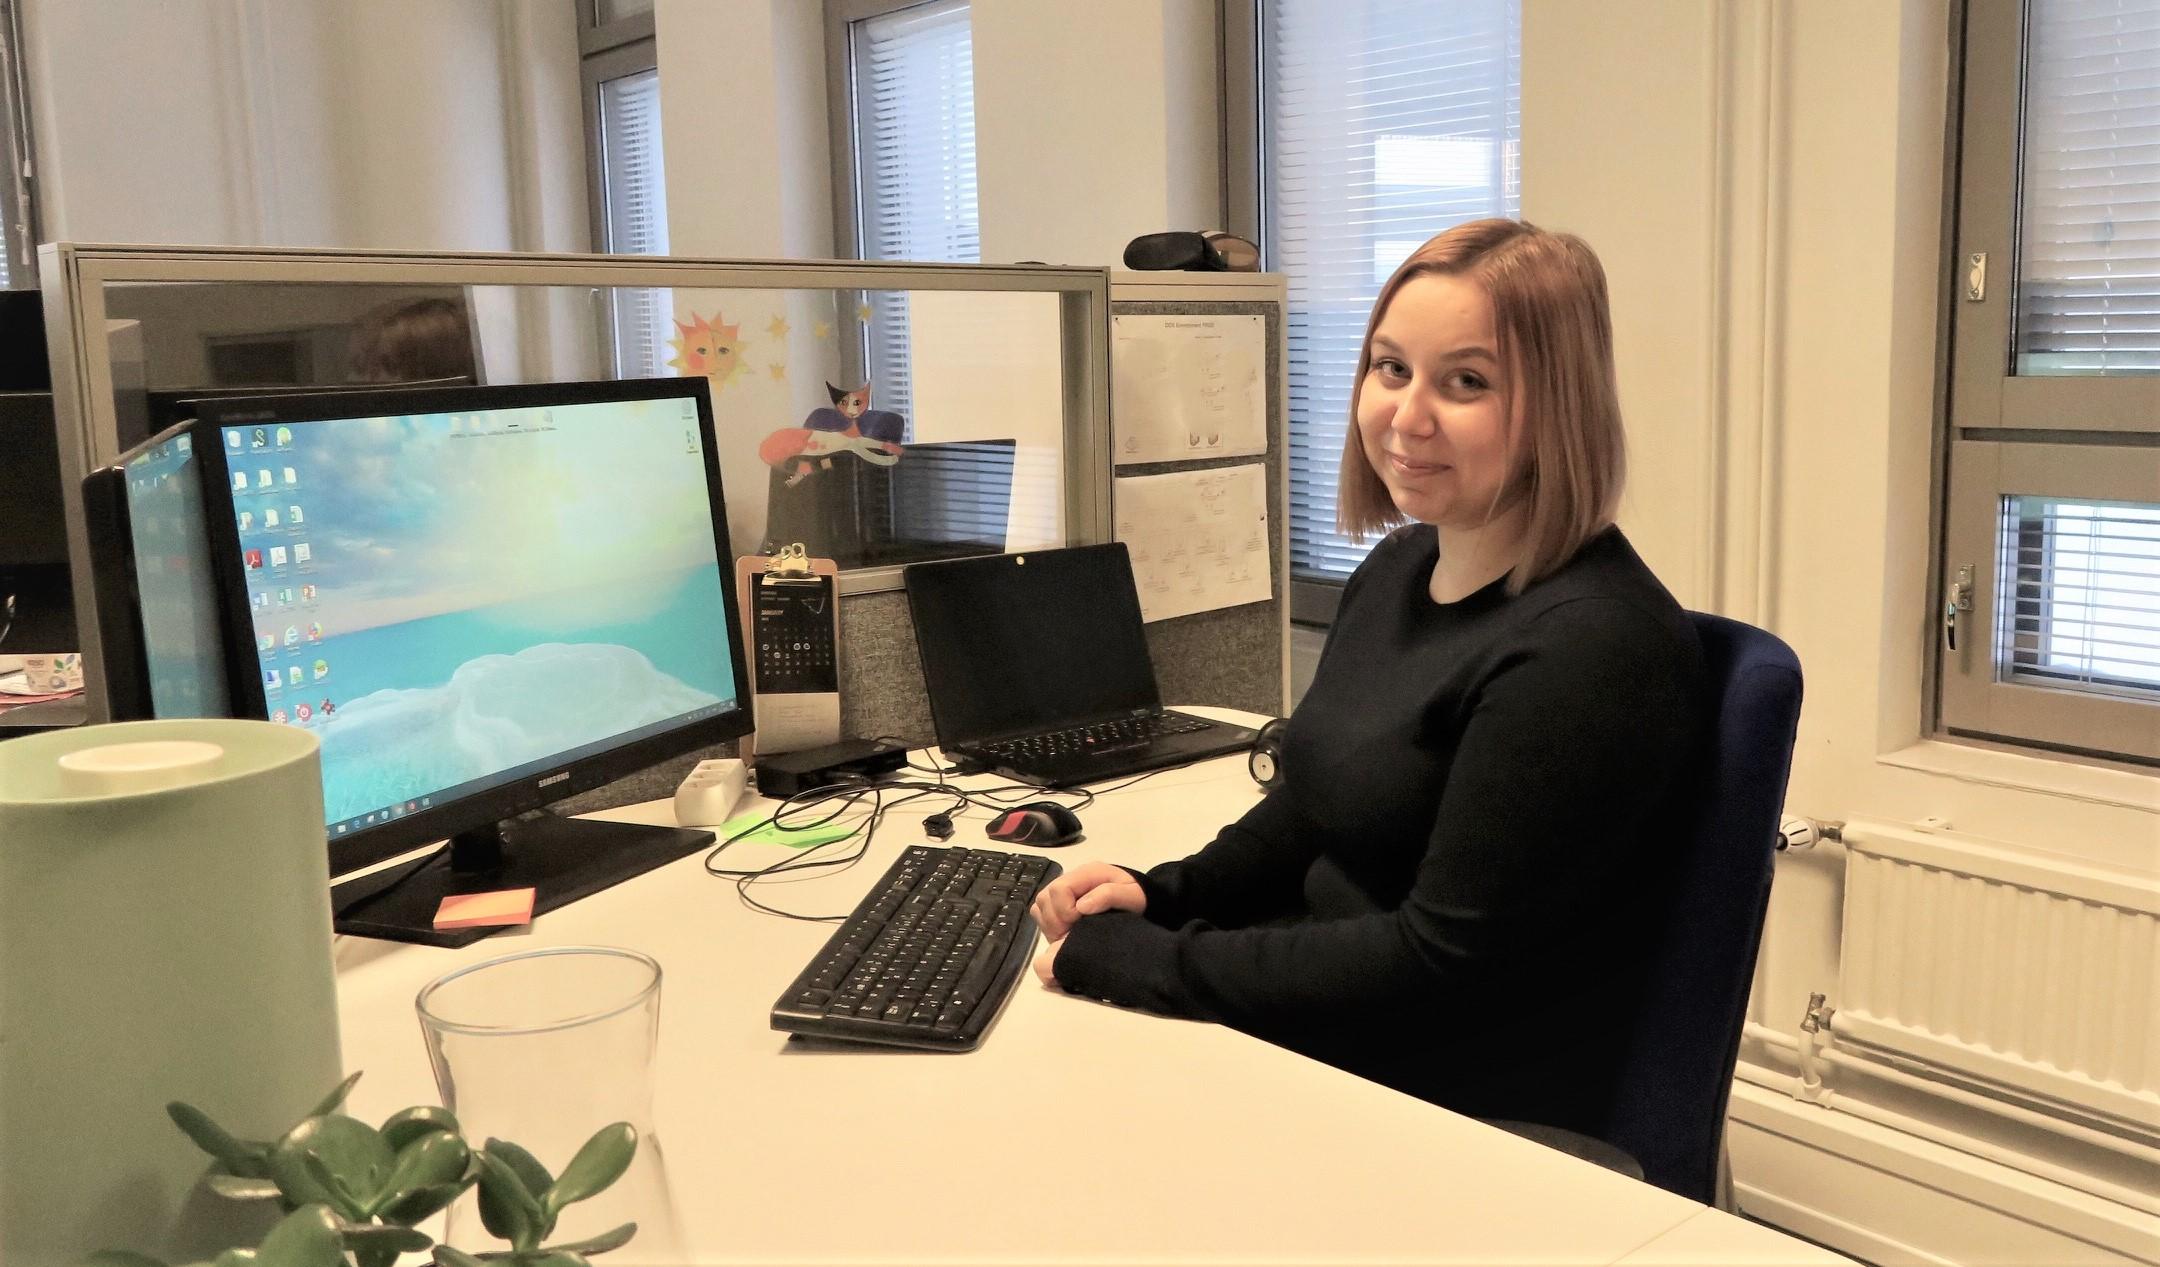 Elinar's Software Designer Kaisa Rauta sitting in front of her desk